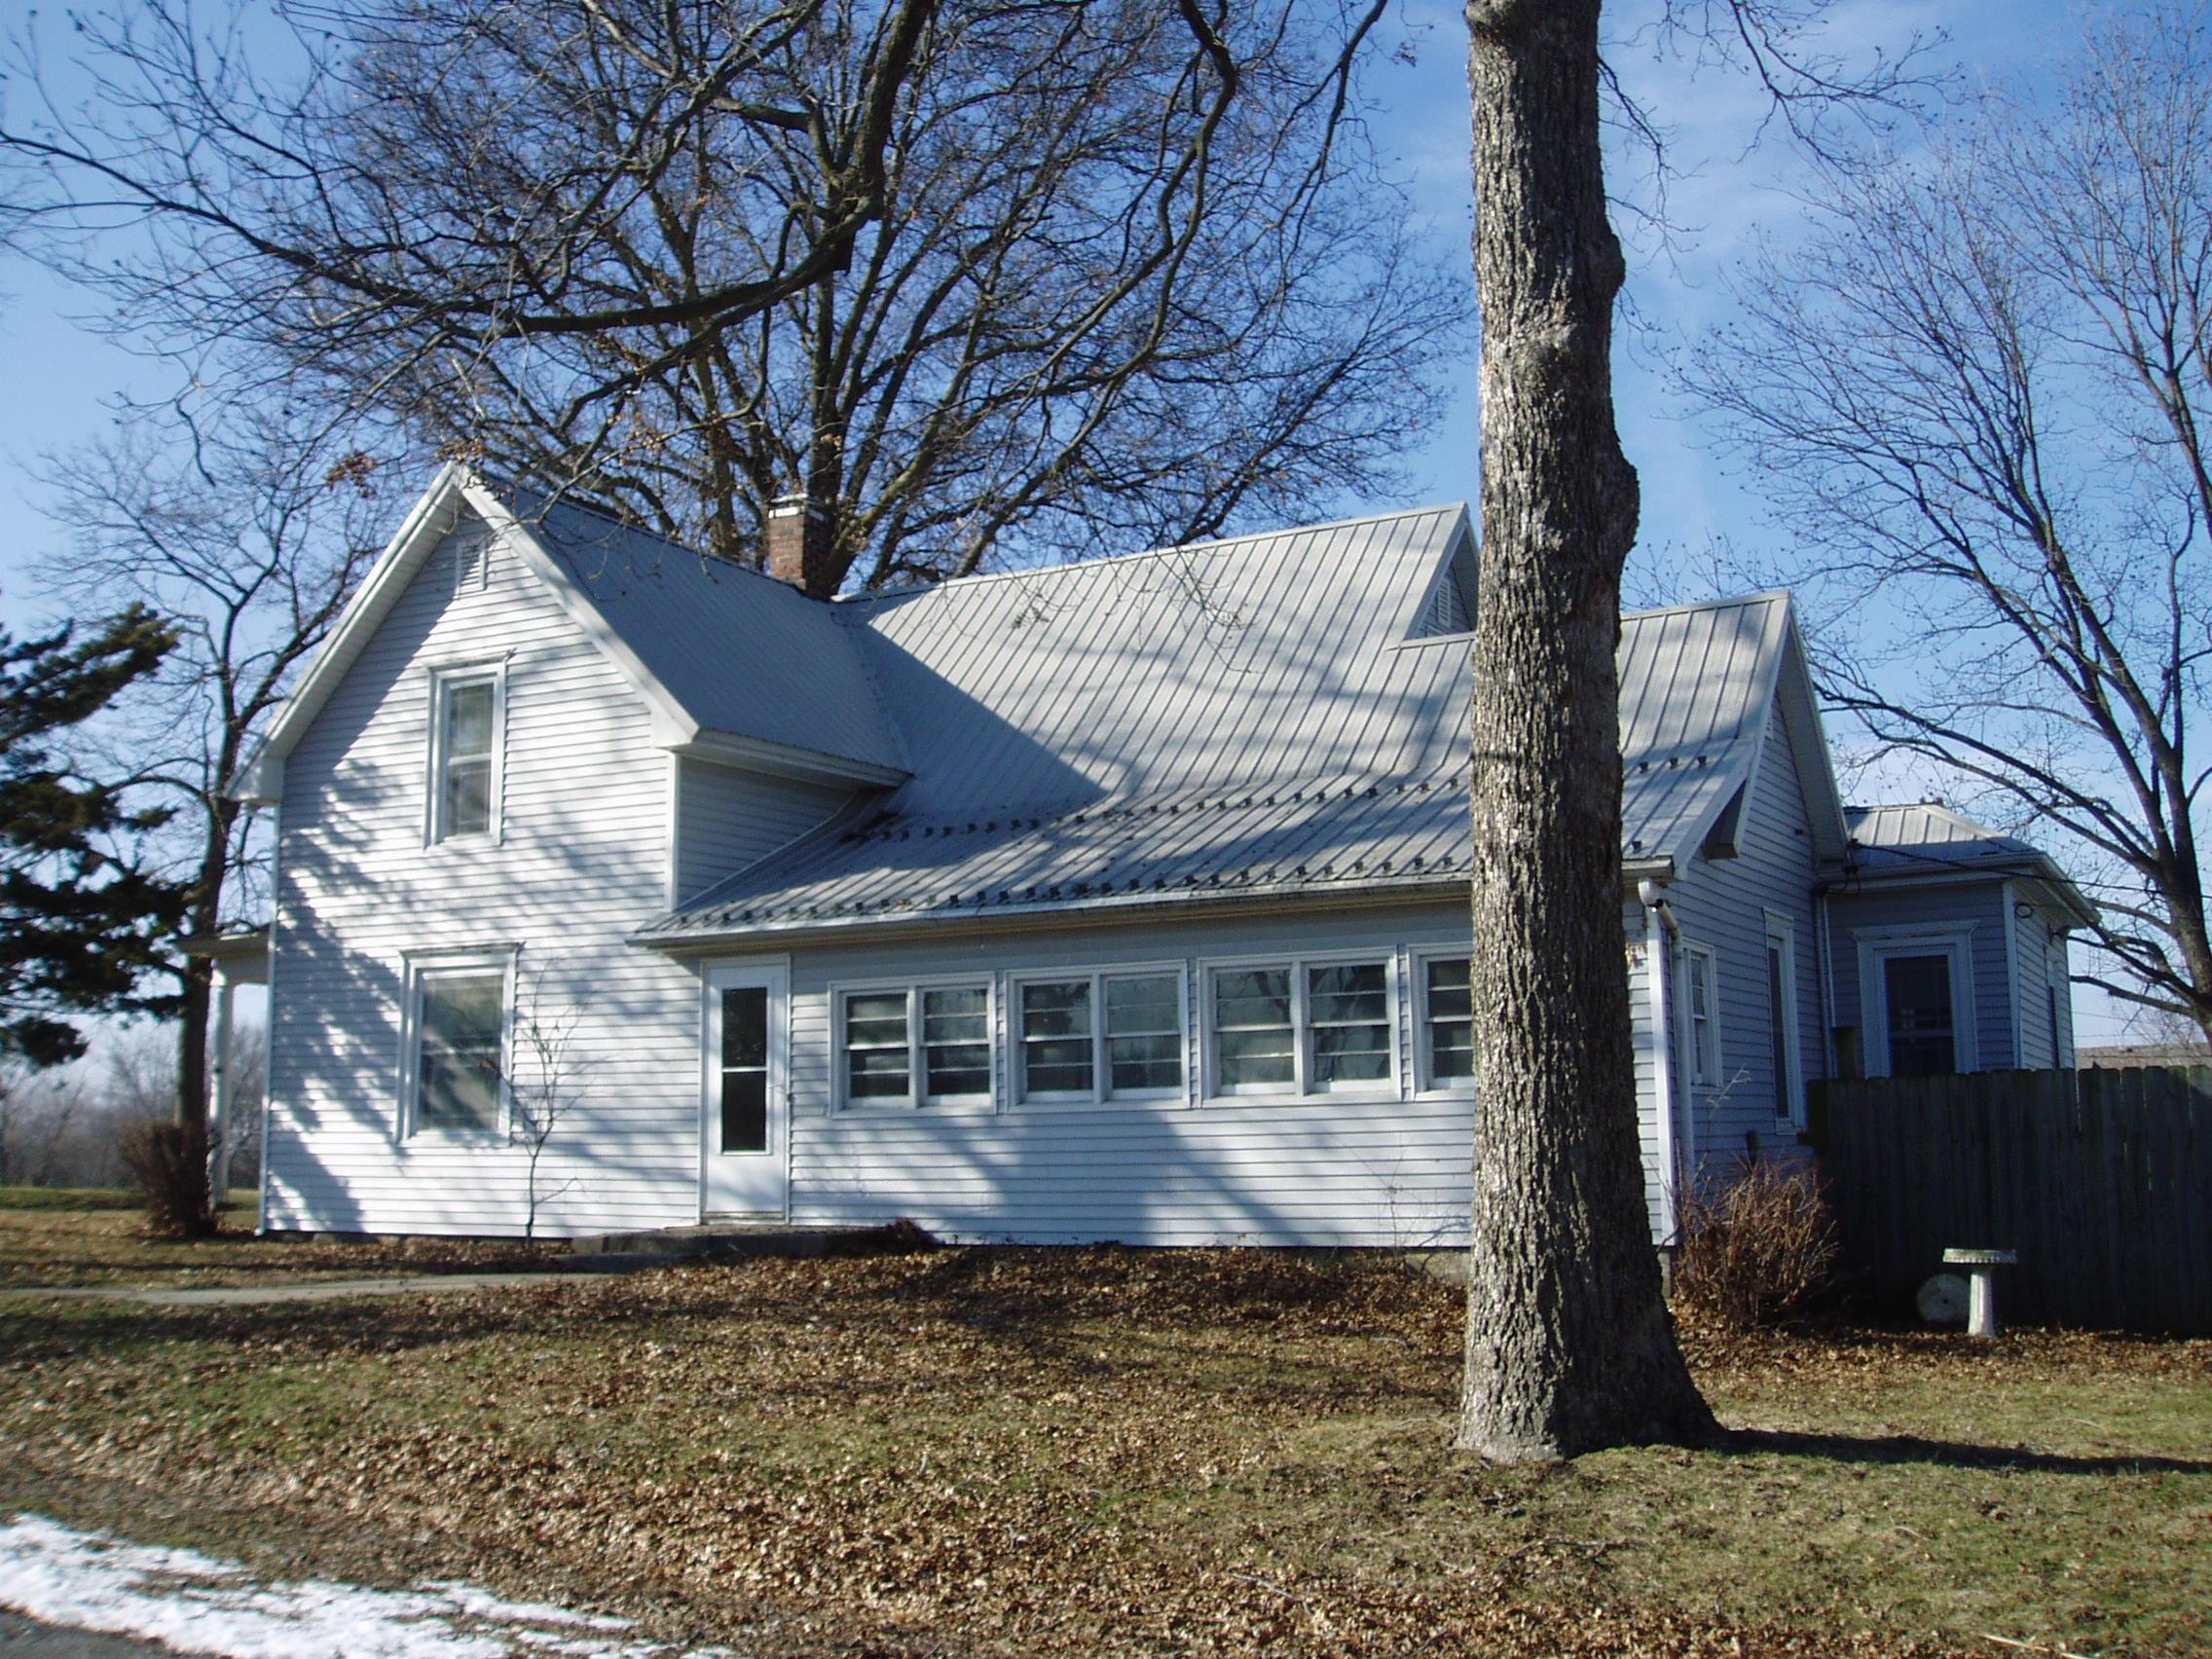 402 West Second Street, Salisbury, Missouri 65281